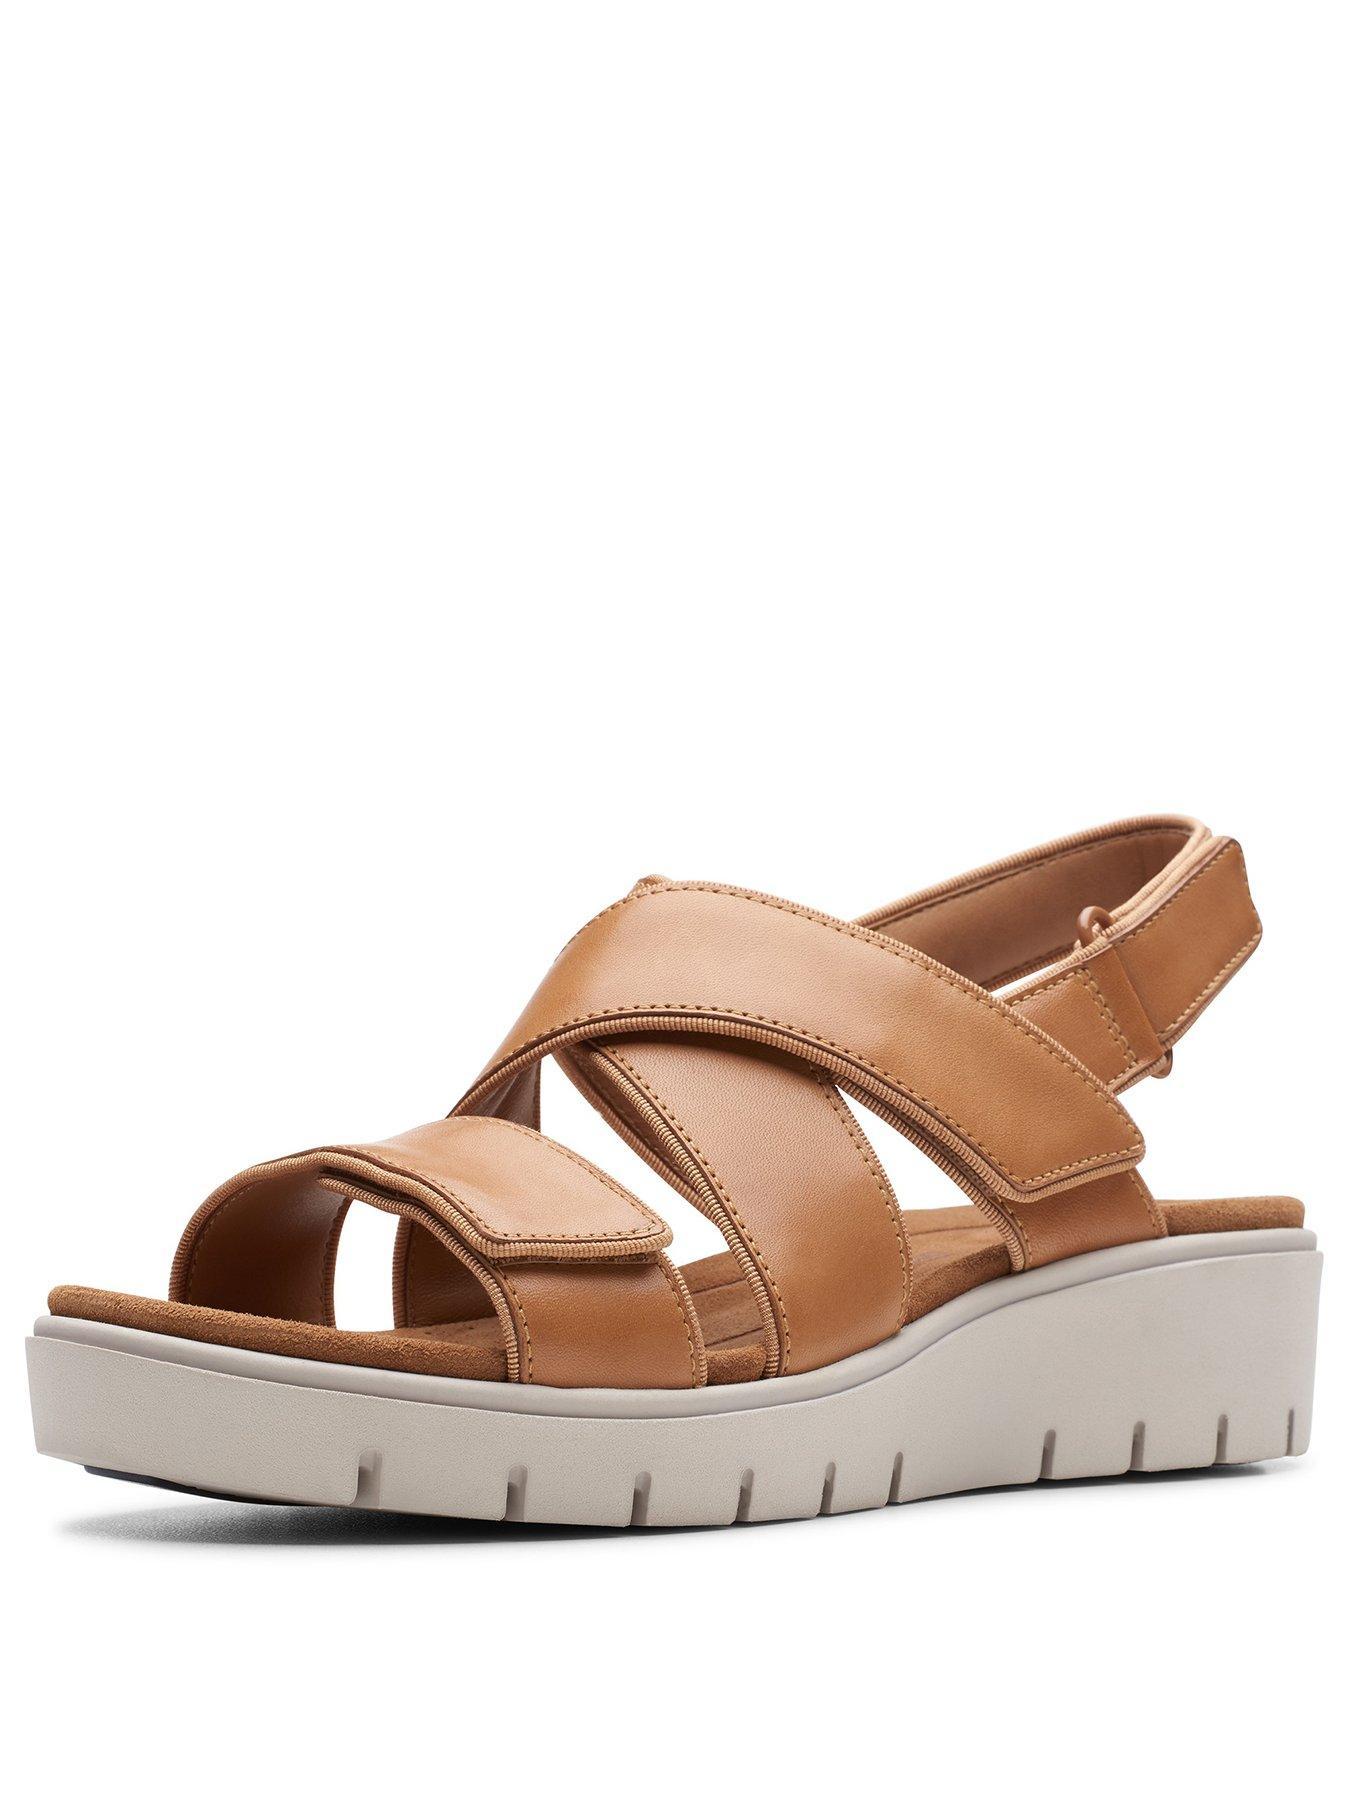 Clarks Unstructured Un Karely Dew Wedge Sandals Tan | very